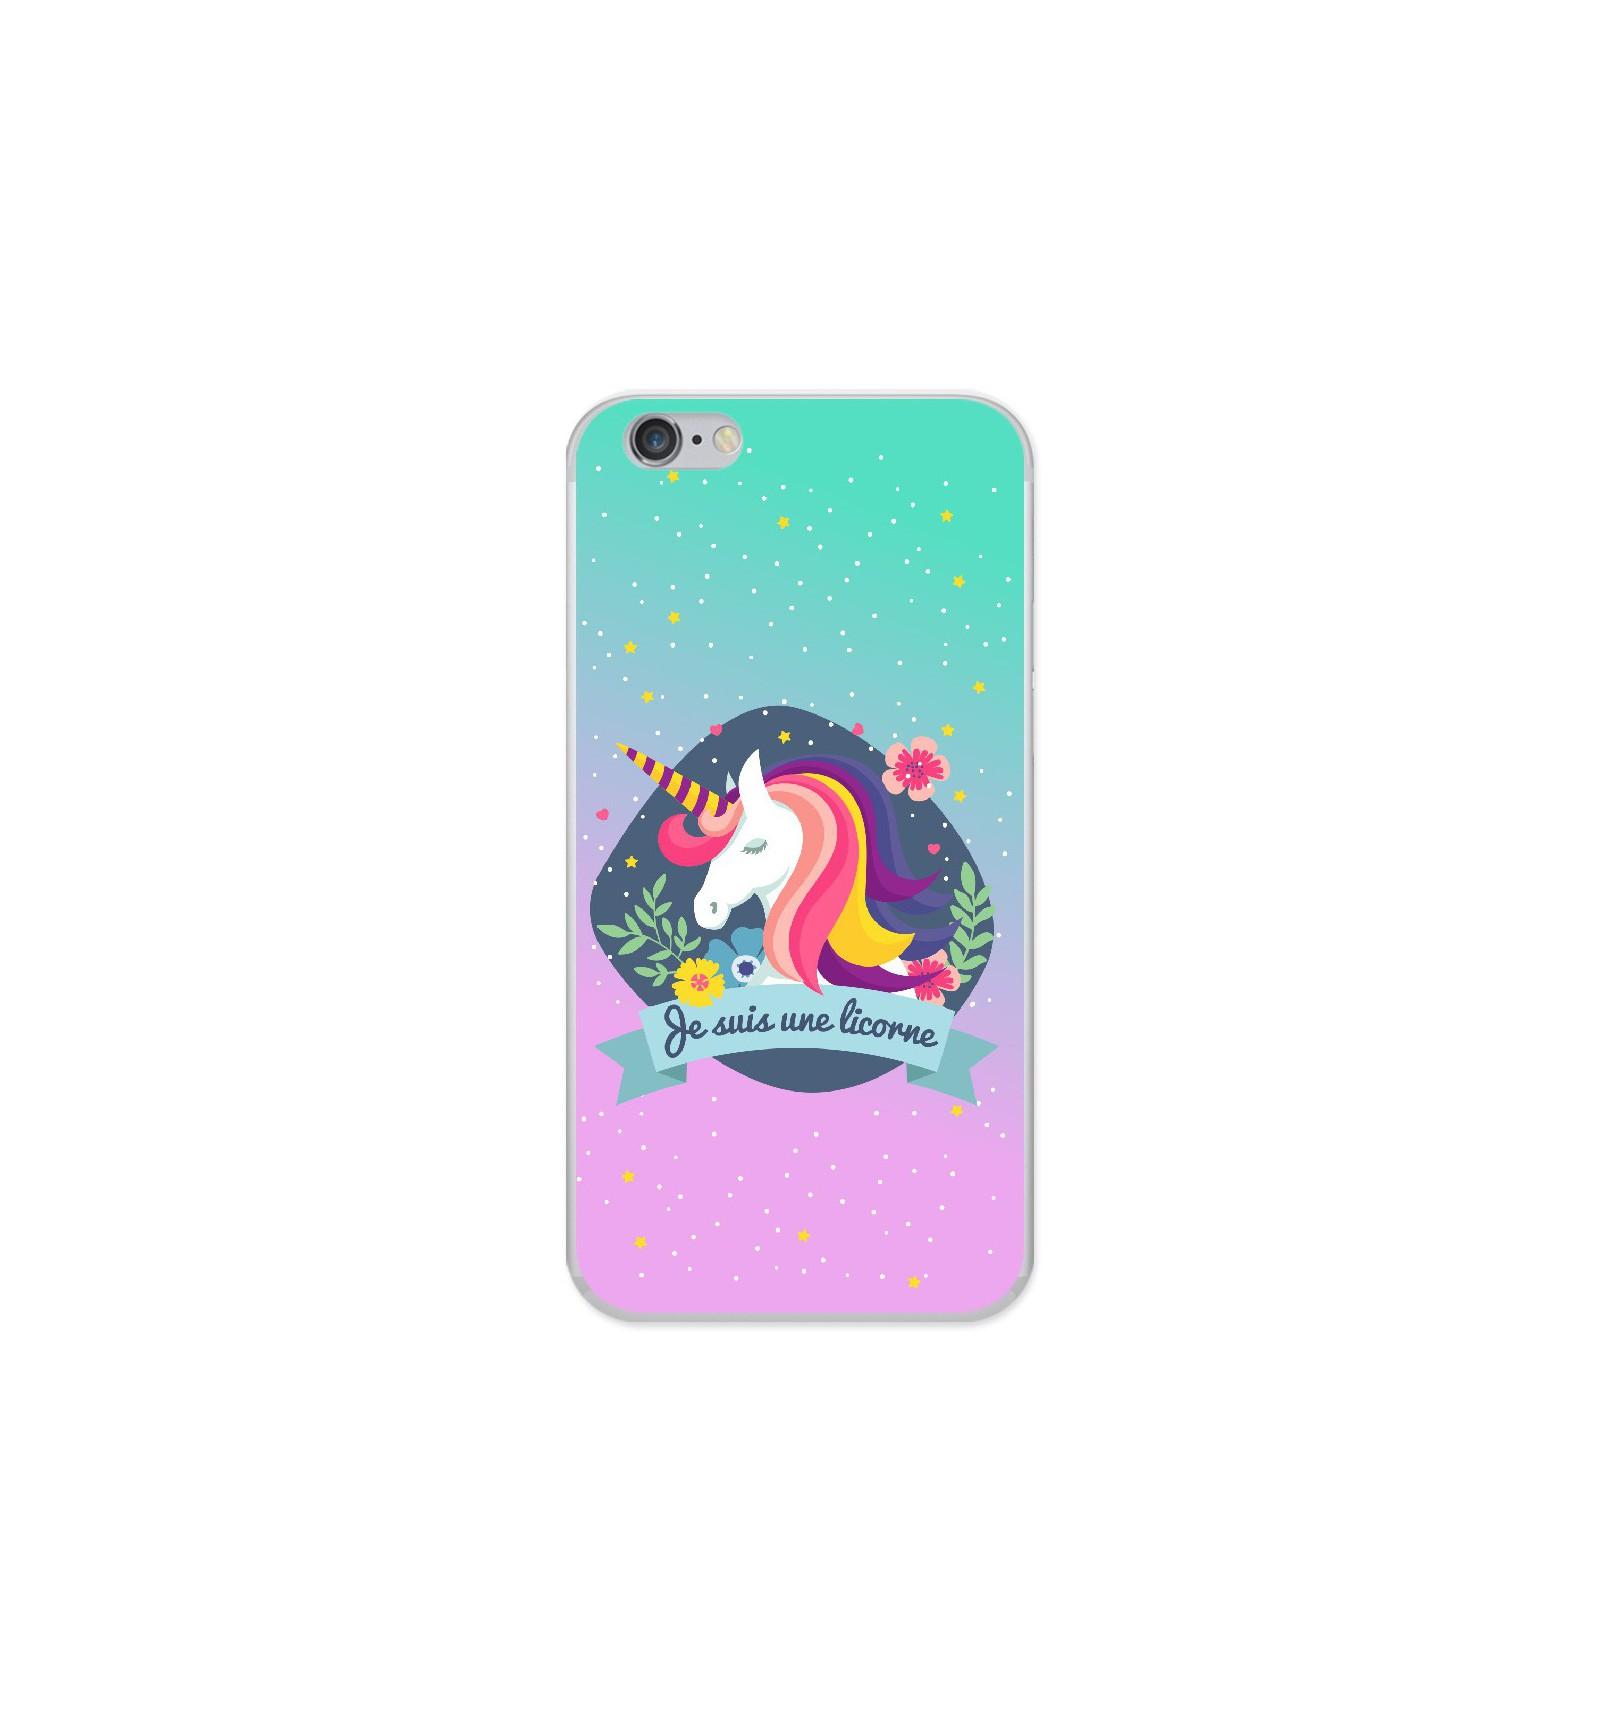 Coque en silicone Apple iPhone 6 / 6S - Je suis une licorne